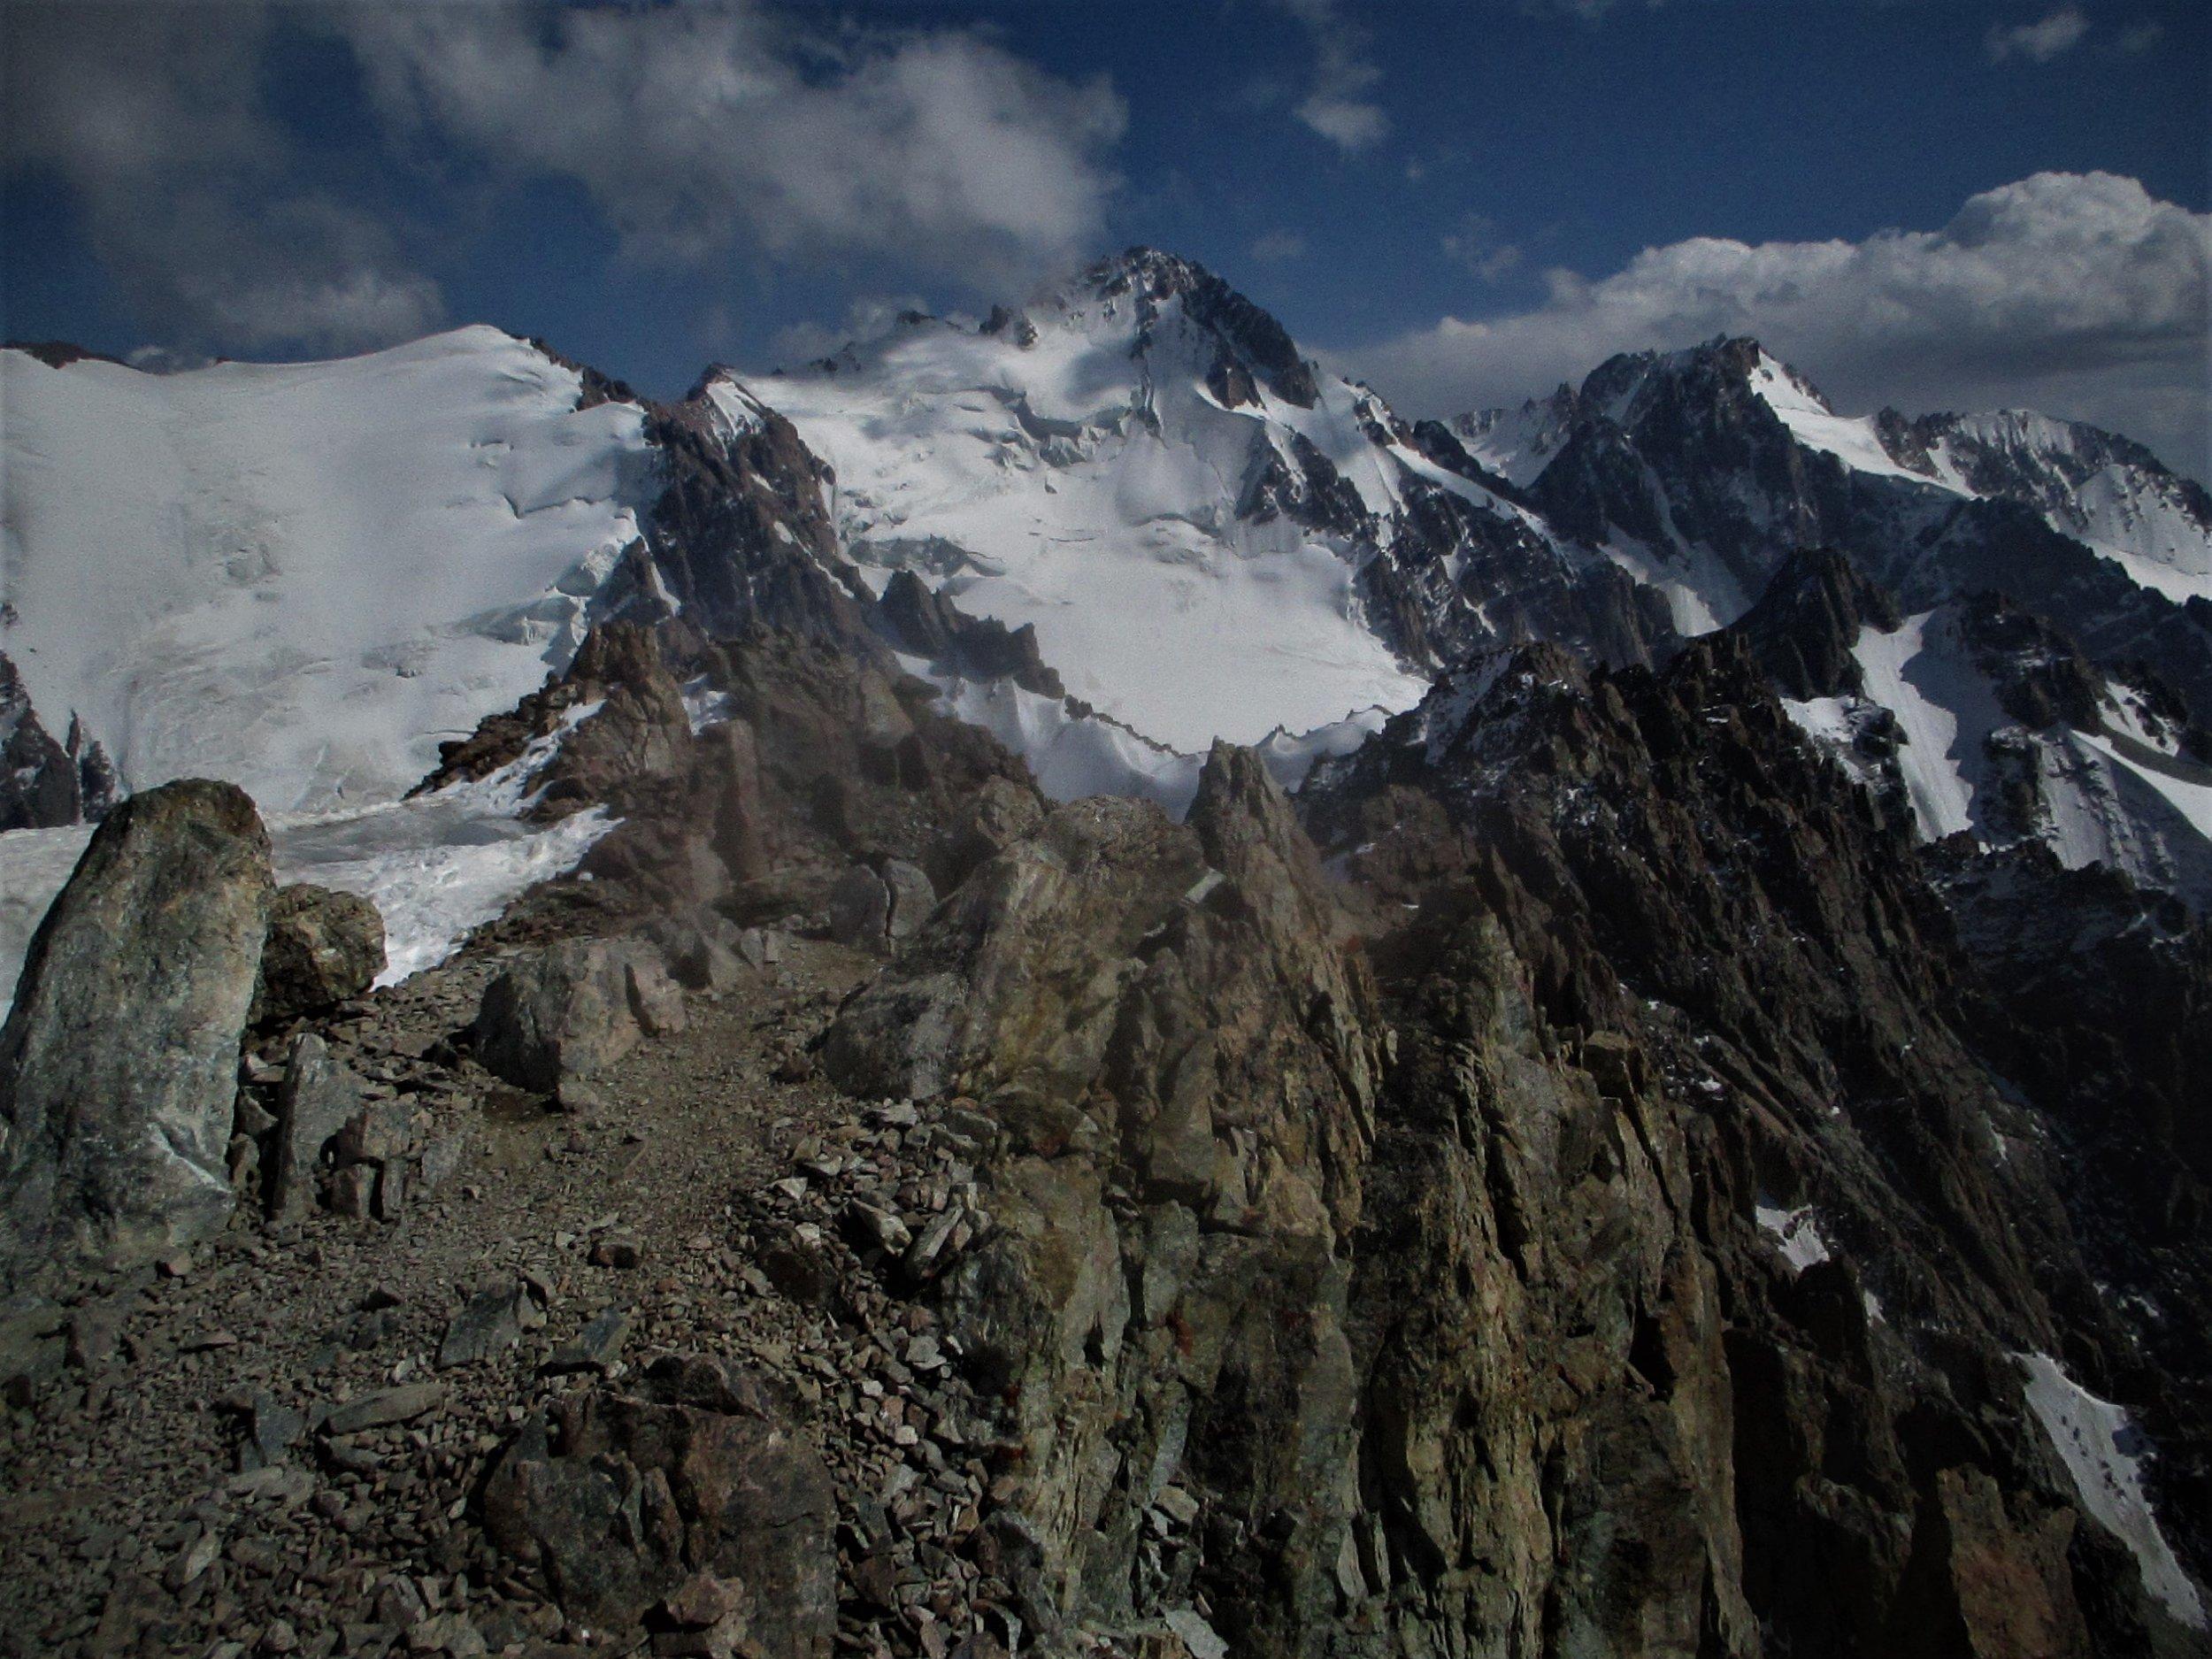 Alps in profusion